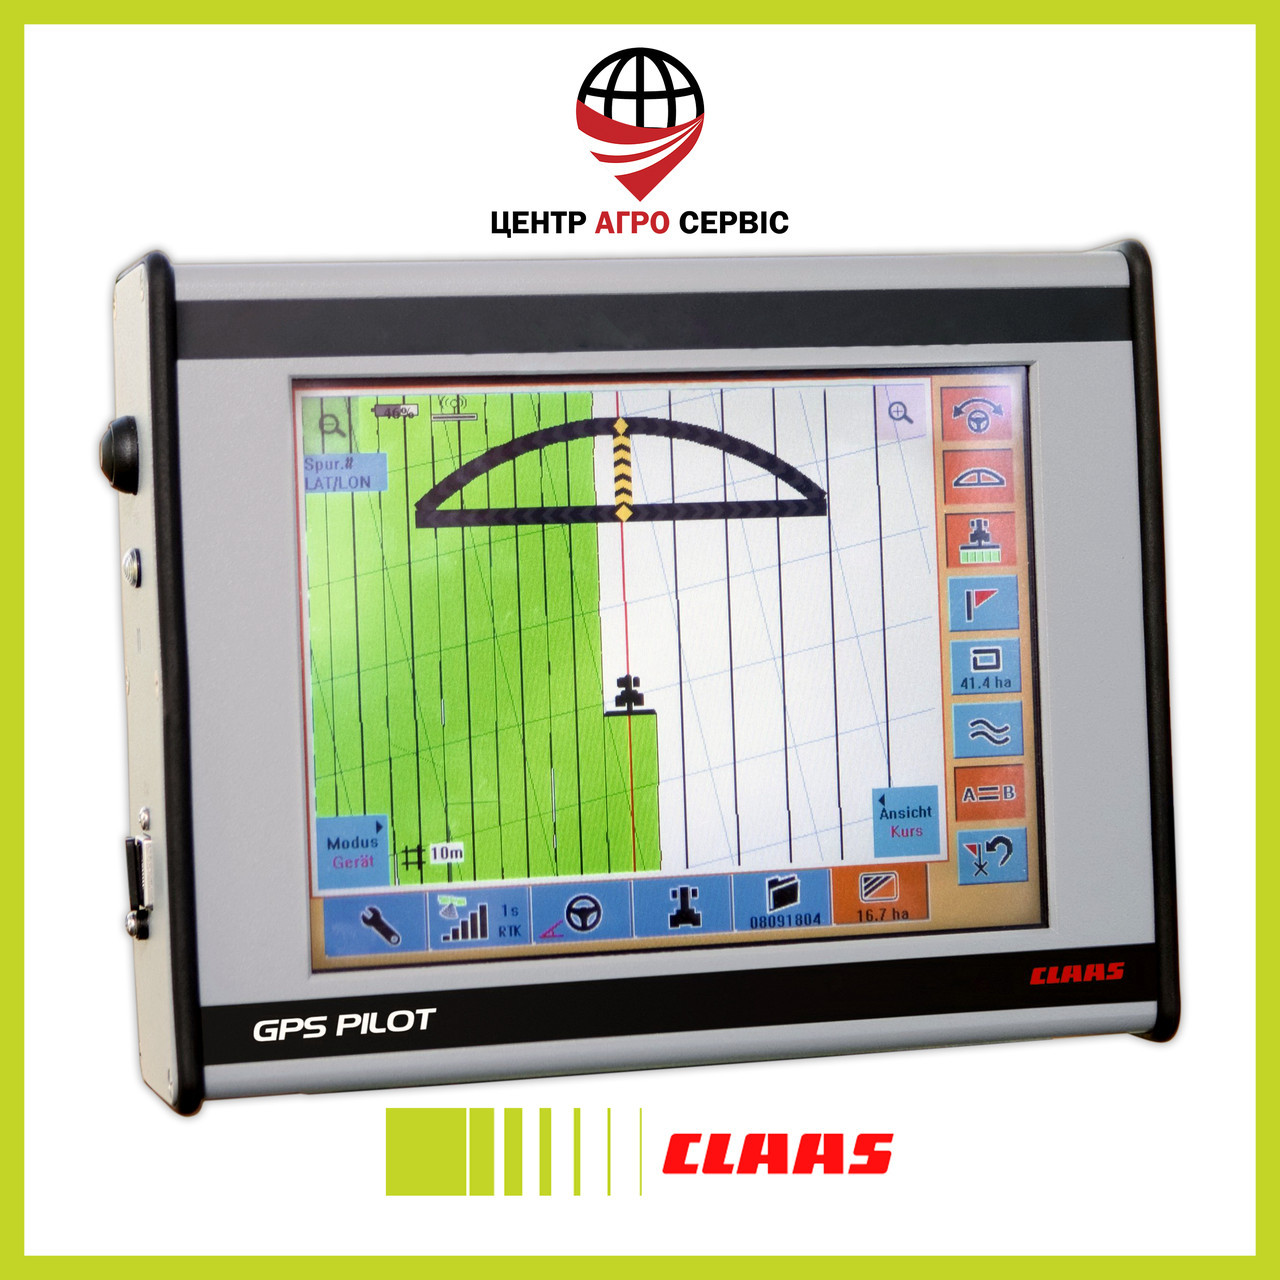 Gps навигатор для трактора (навигатор для поля, сельхоз навигатор)  CLAAS gps copilot s3